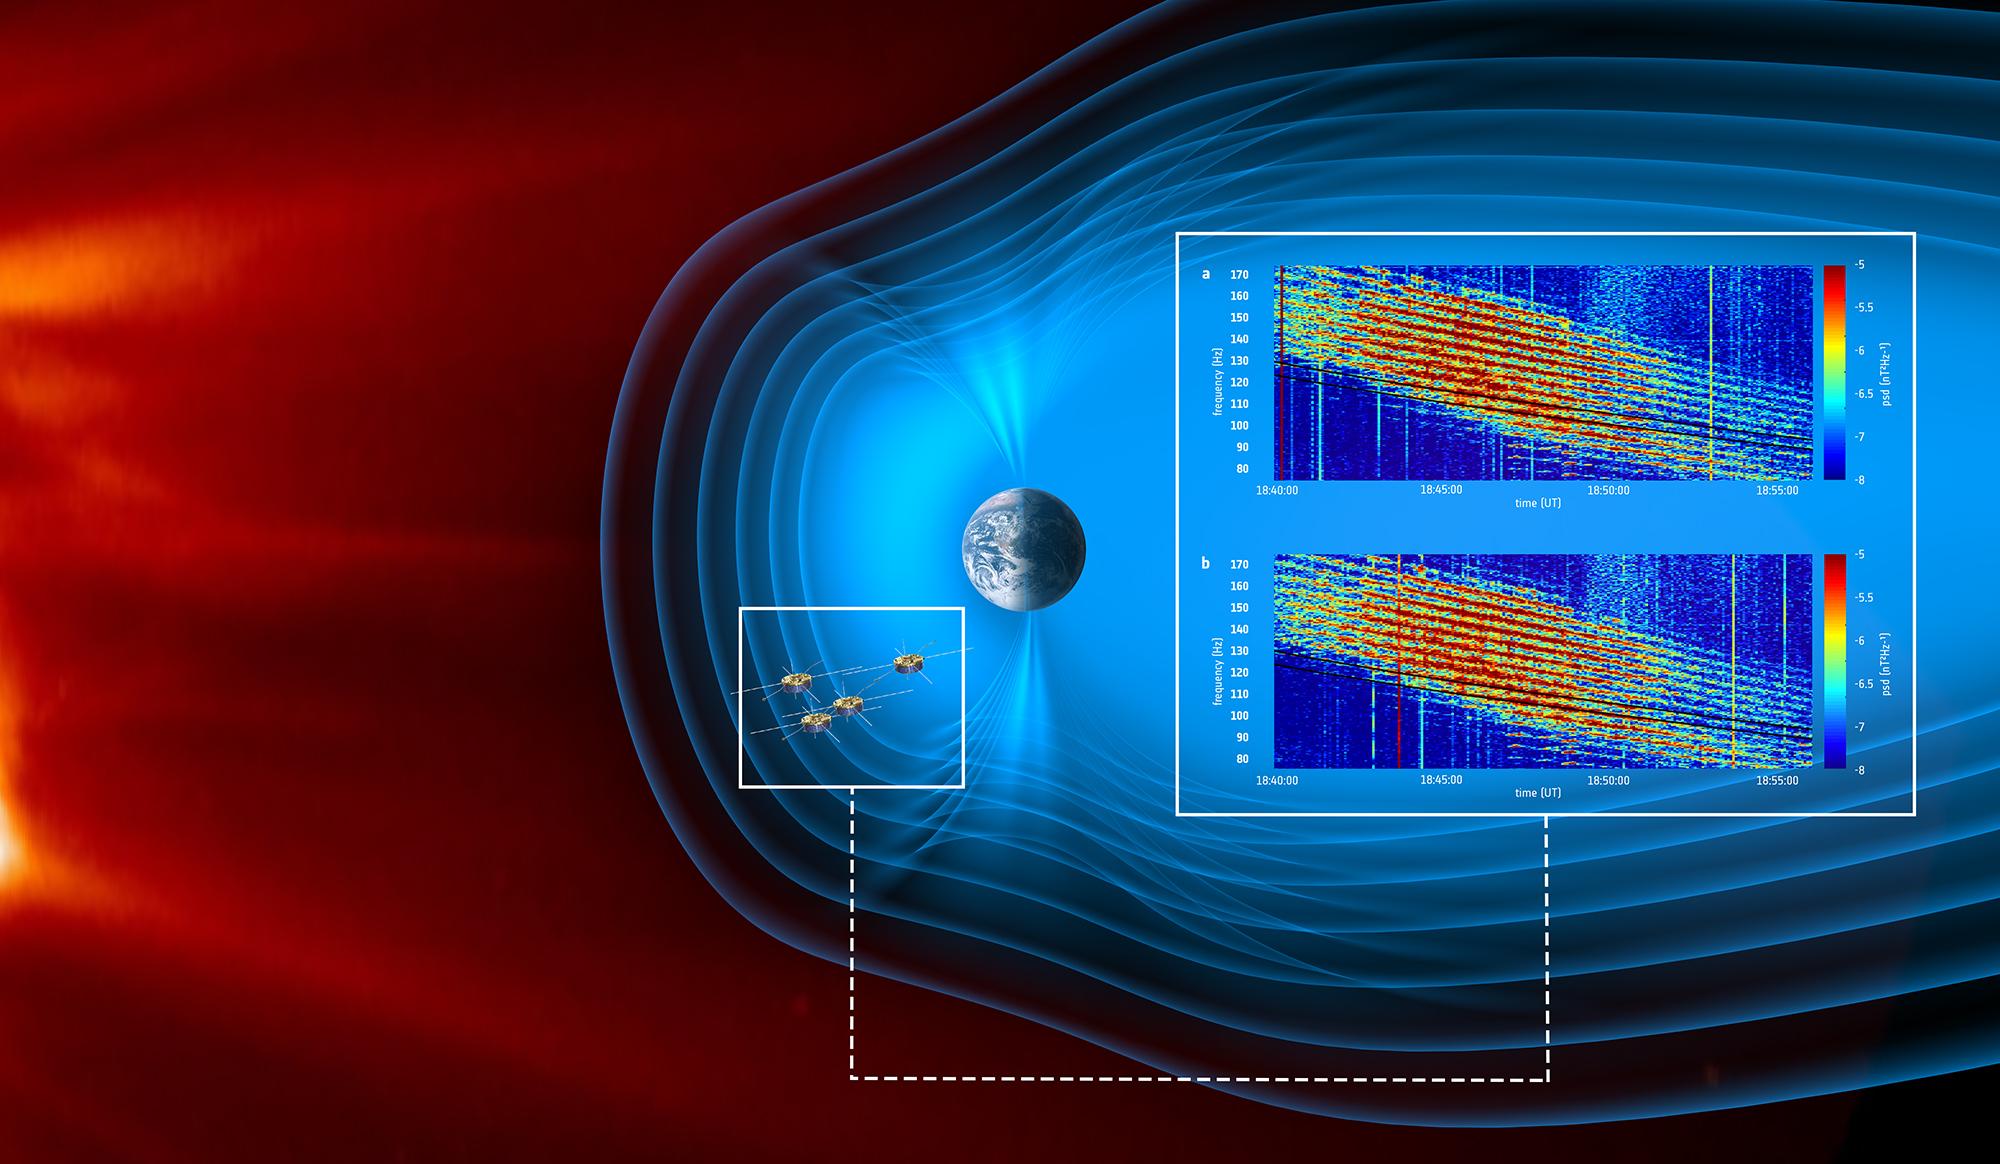 1567216144923-Cluster_observes_equatorial_noise.jpg